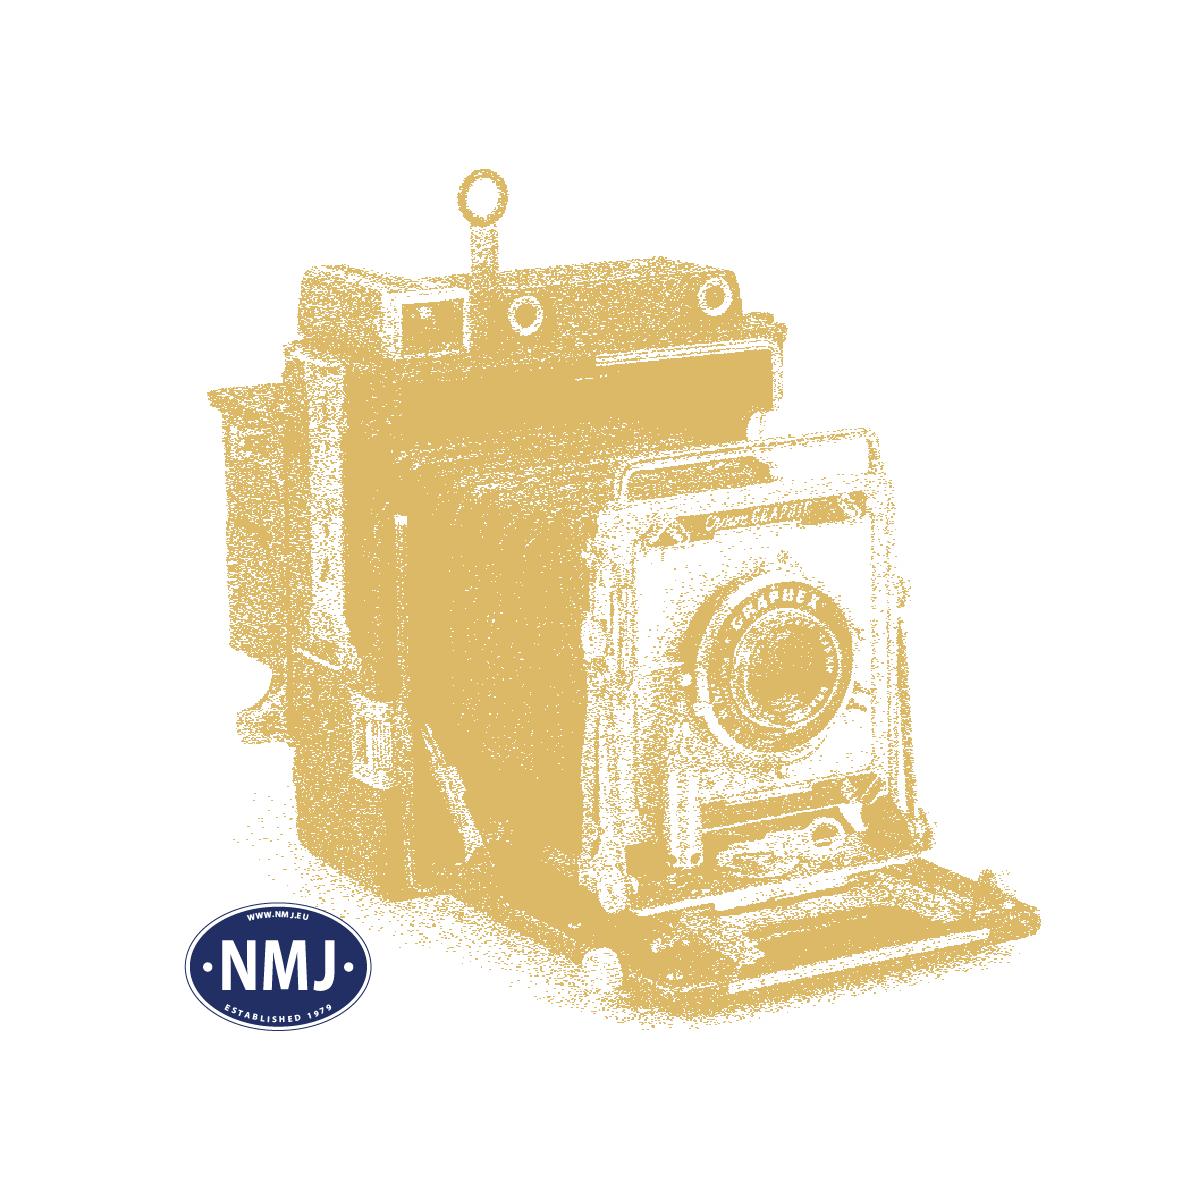 NMJT90013 - NMJ Topline NSB Di3a 614, Gammeldesign, DCC m/ Lyd